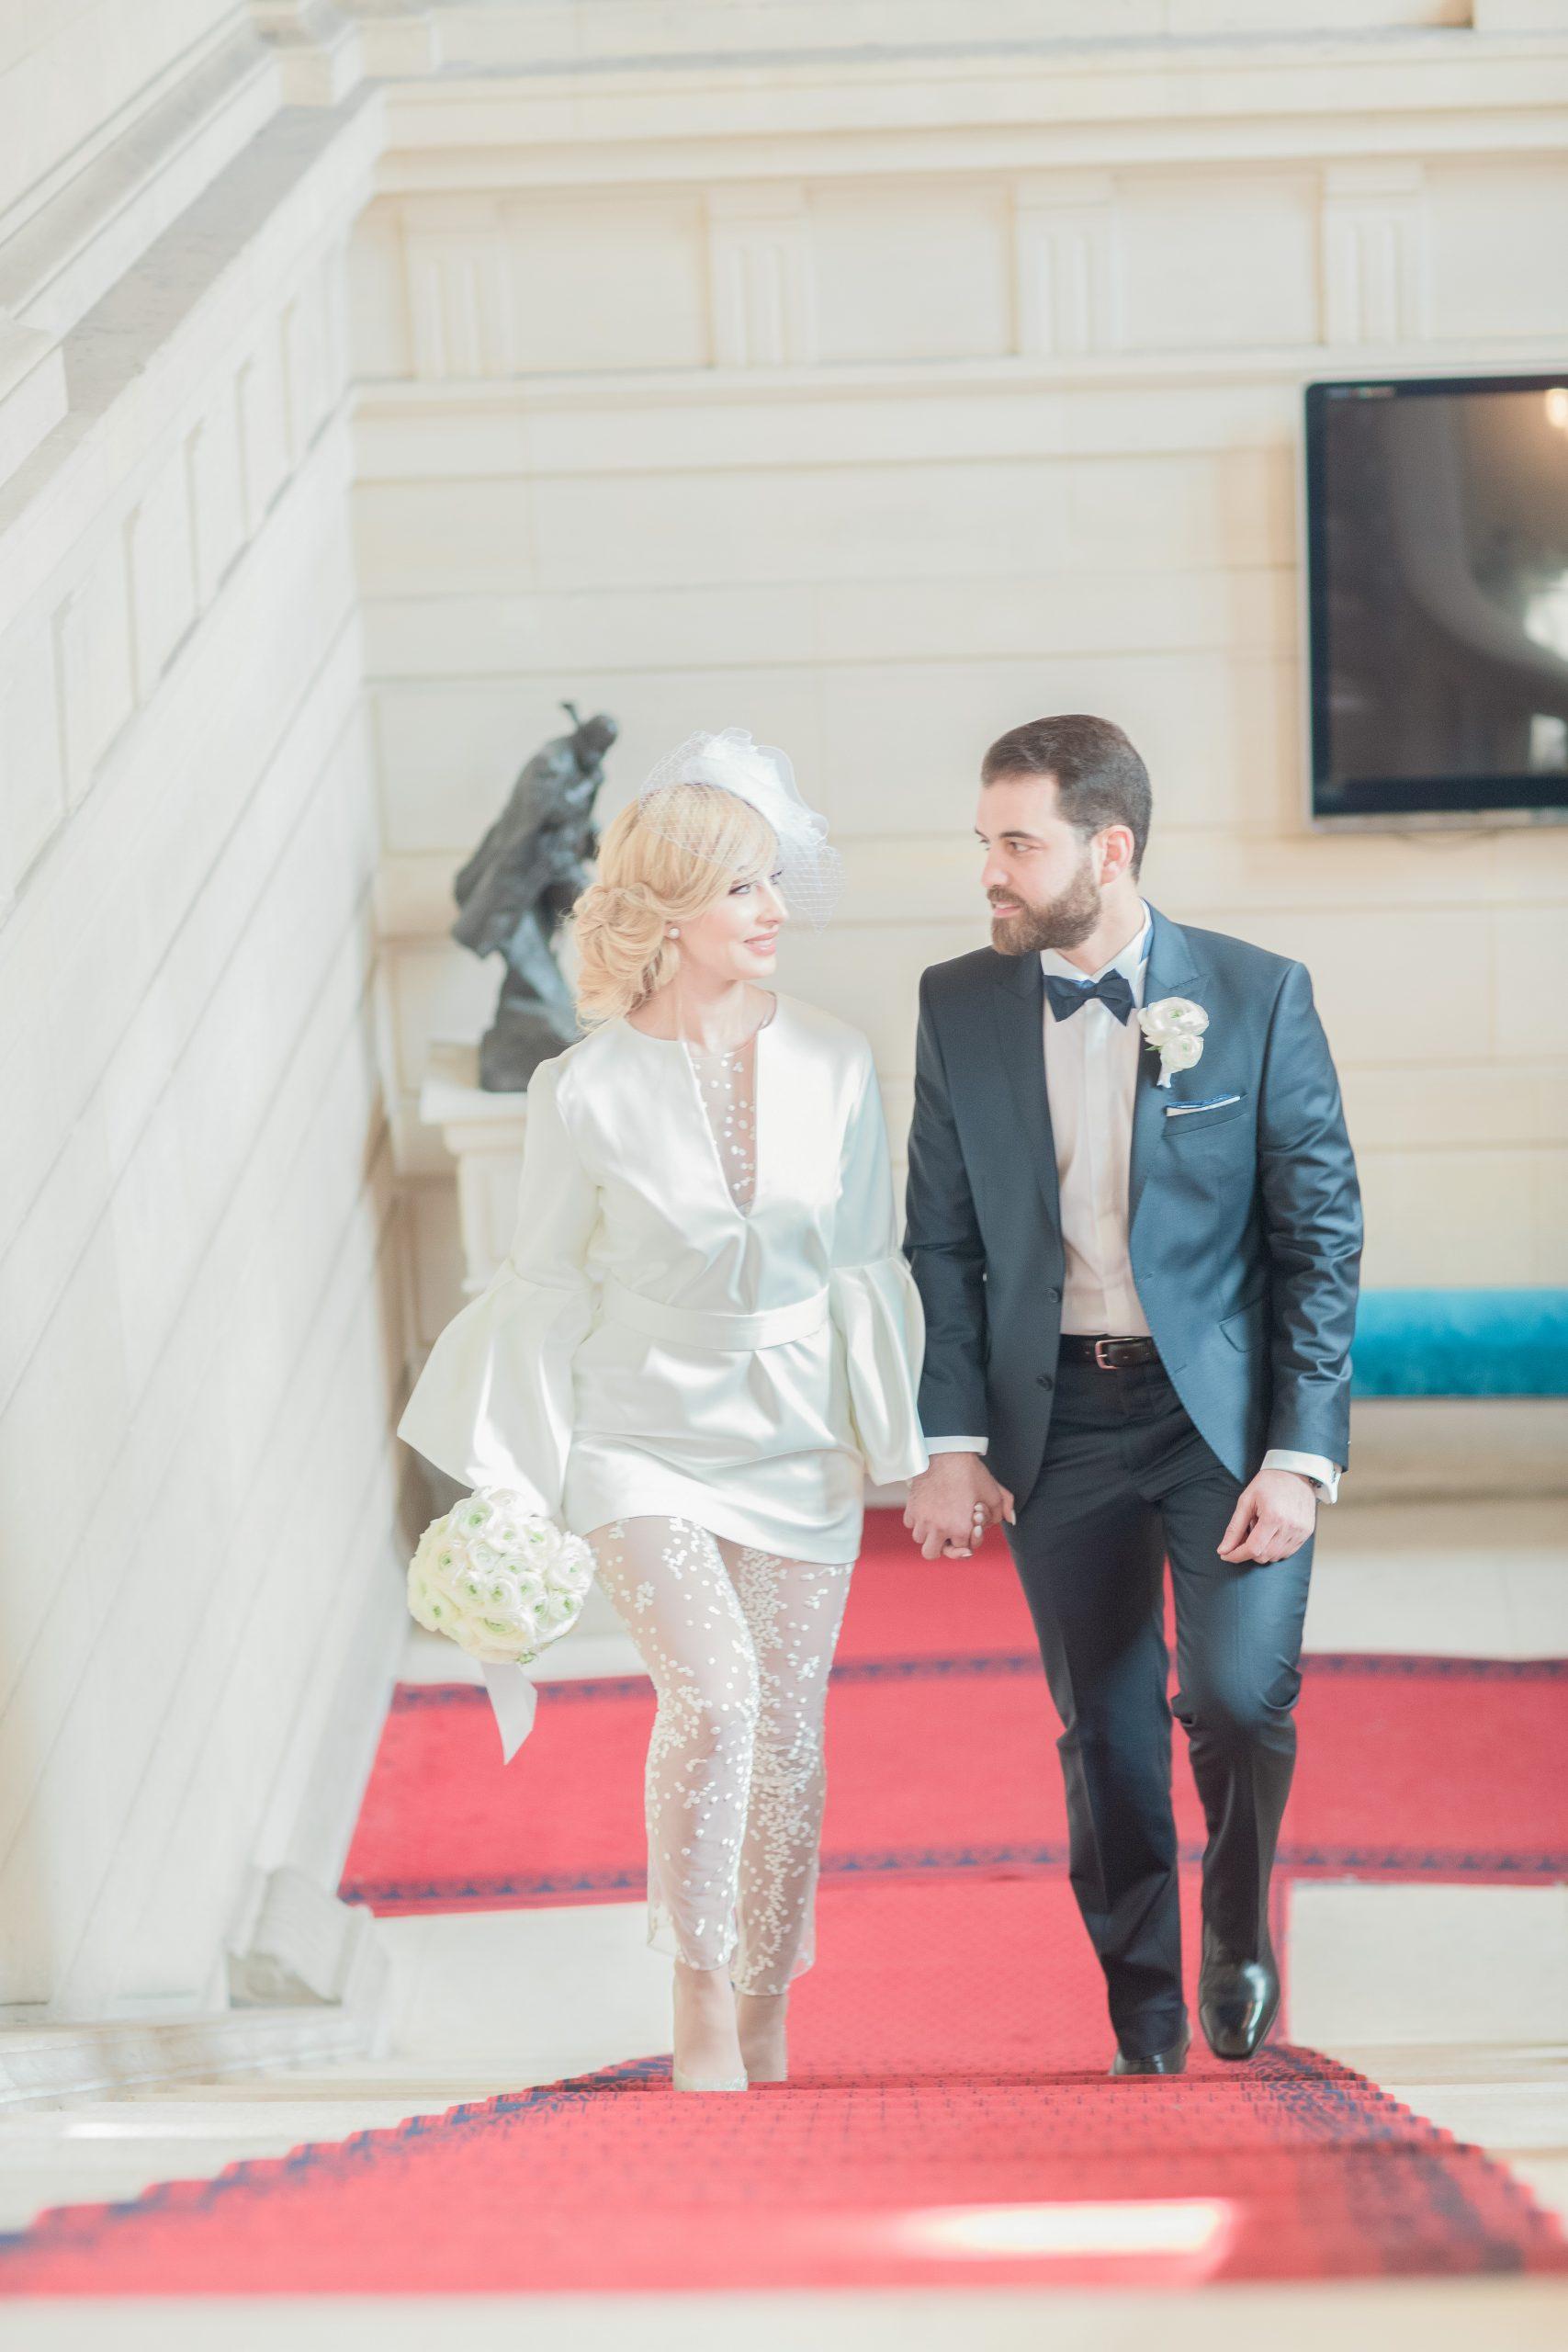 photographe-mariage-arrivée-mariés-mairie16e